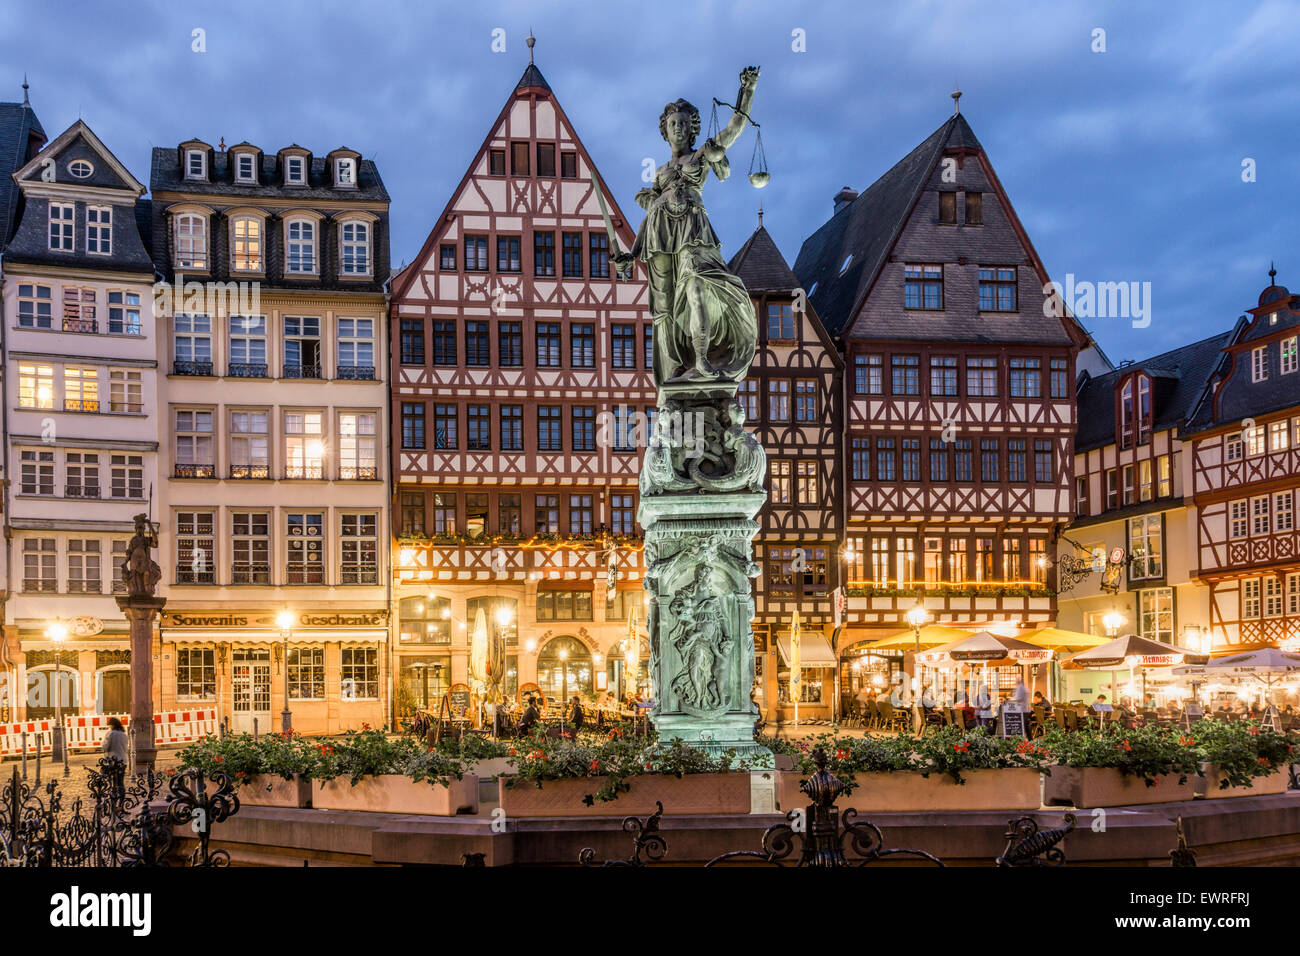 Justitia, Fountain of Justice, Restaurants, Cafes,  Roemerberg Frankfurt Germany - Stock Image